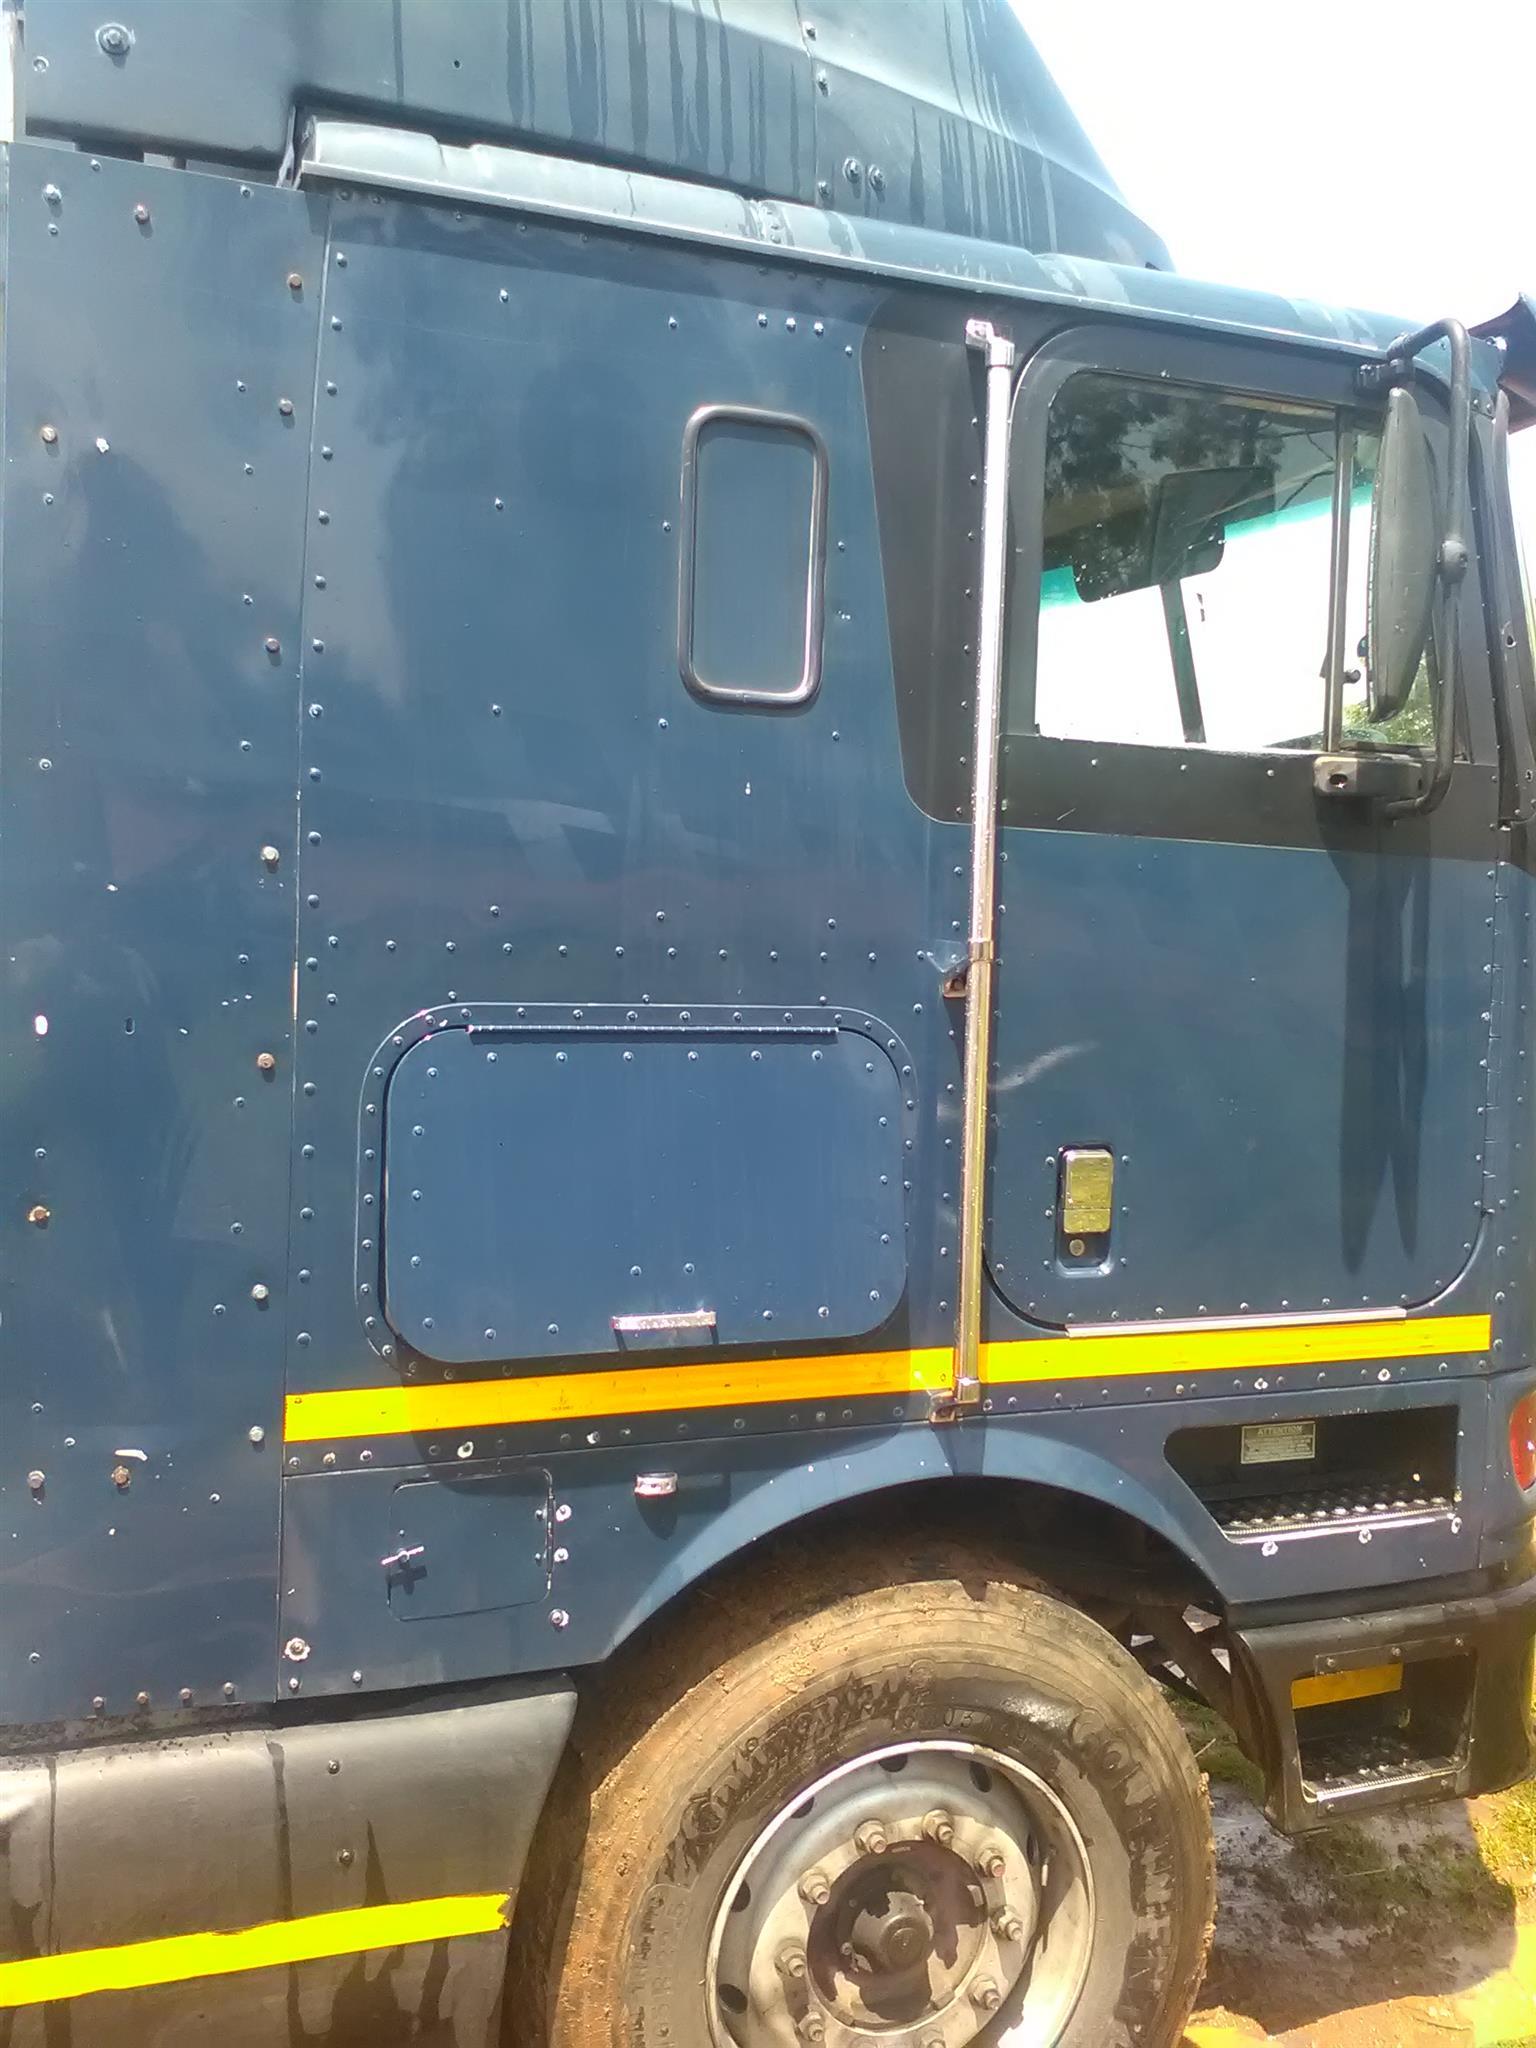 Genuine, road-worthy truck tractor on sale!